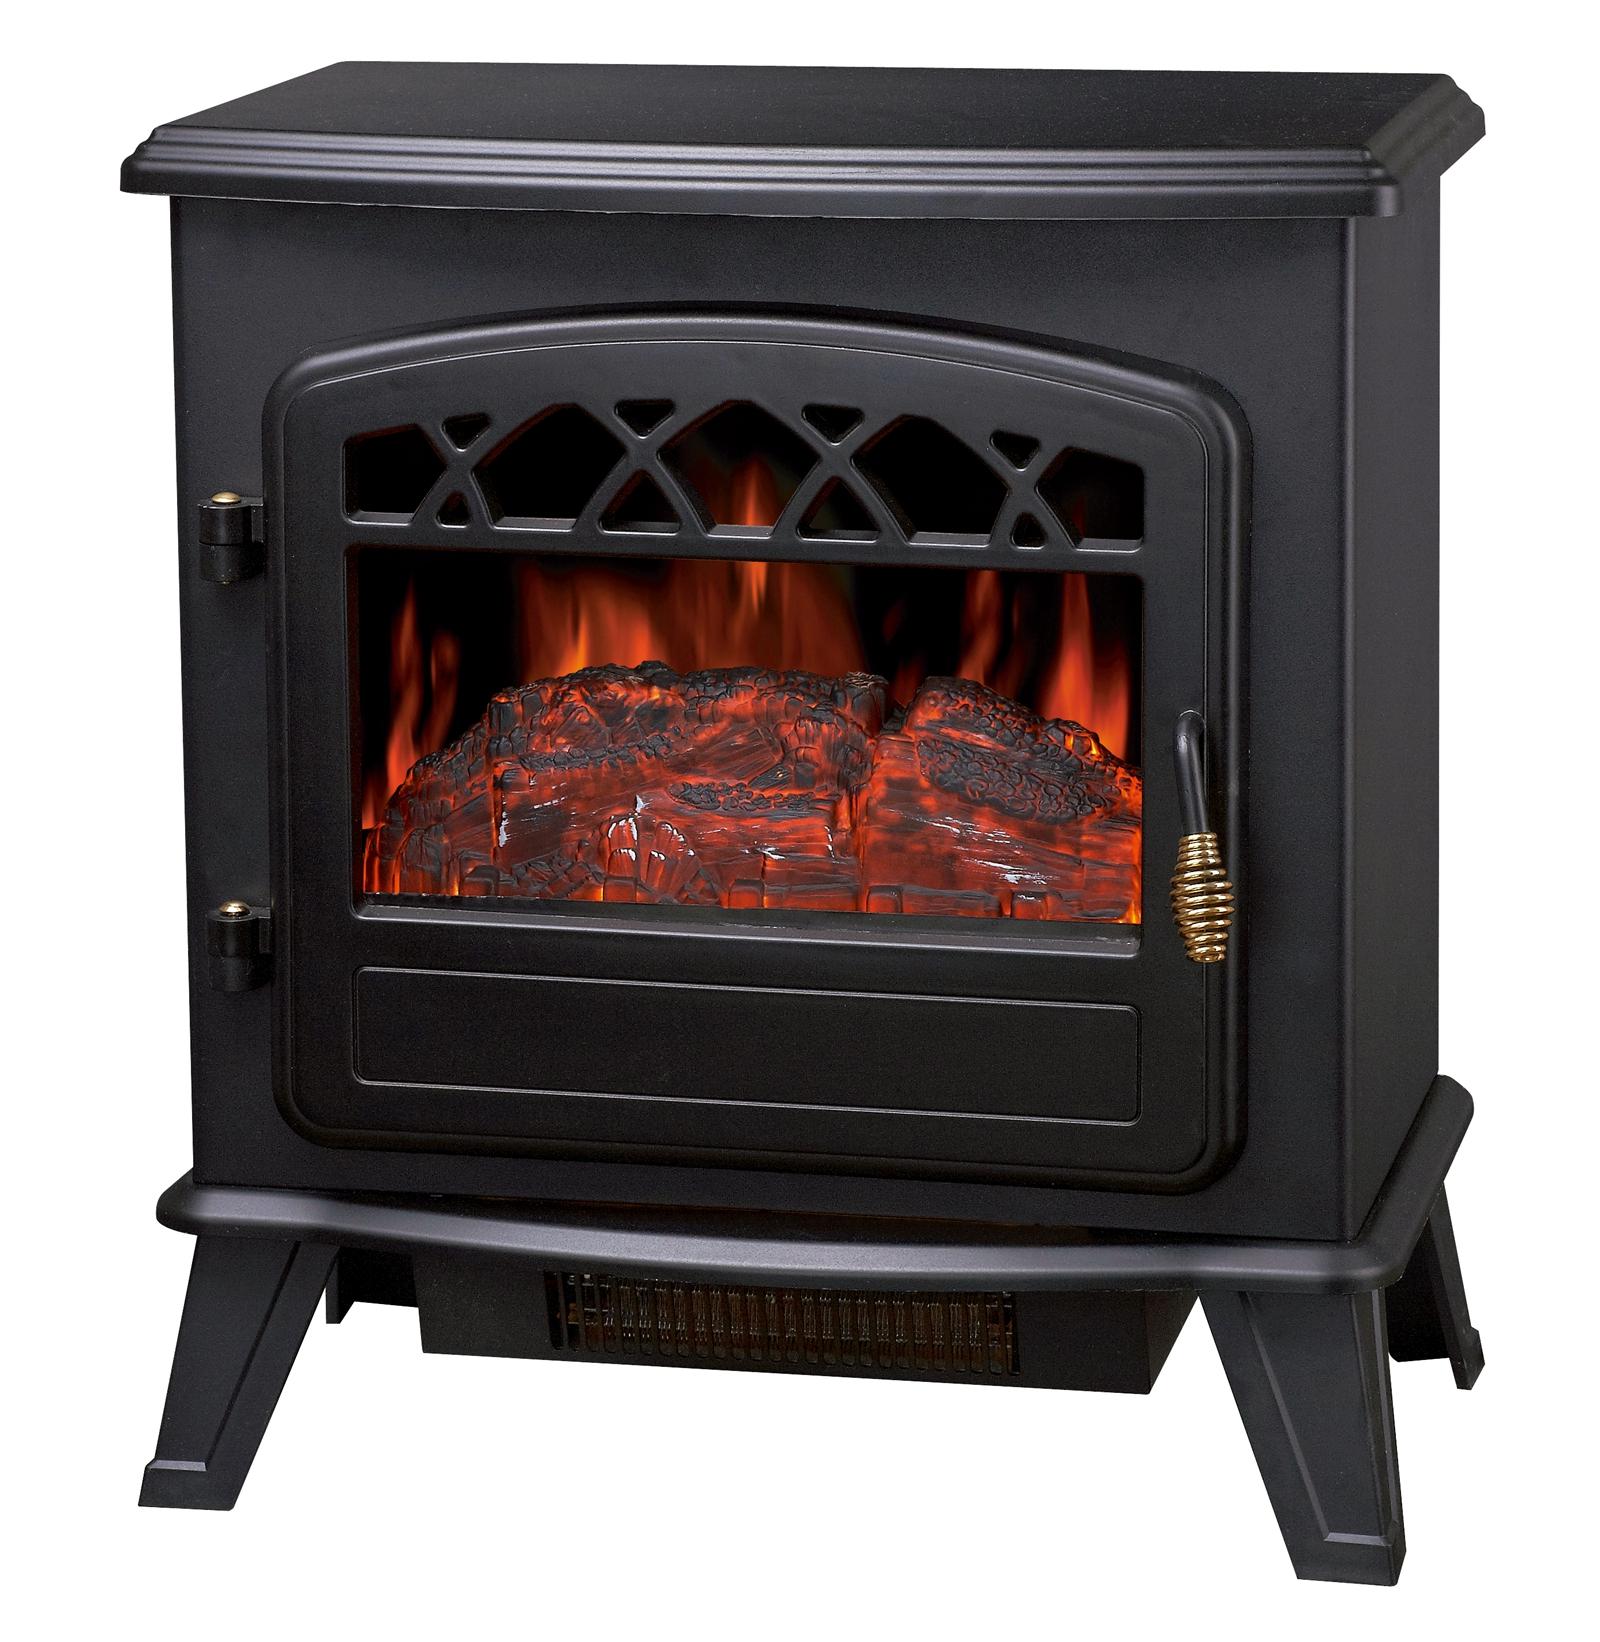 foxhunter 1850 chauffe w connexion br lant effet feu lectrique po le chemin e nd 181 m. Black Bedroom Furniture Sets. Home Design Ideas